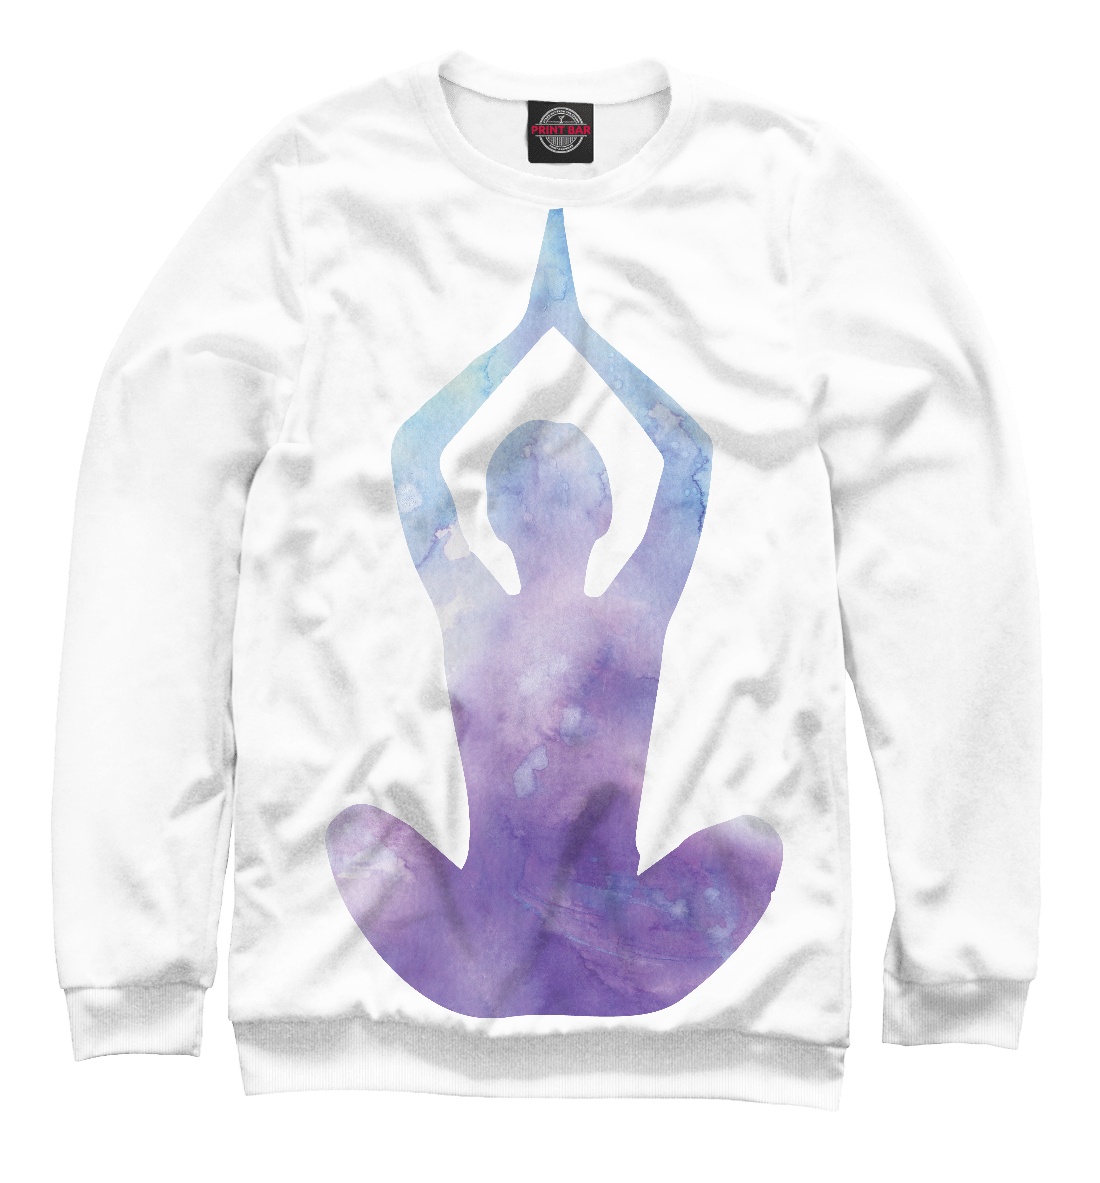 Купить Йога, Printbar, Свитшоты, FIT-574494-swi-1